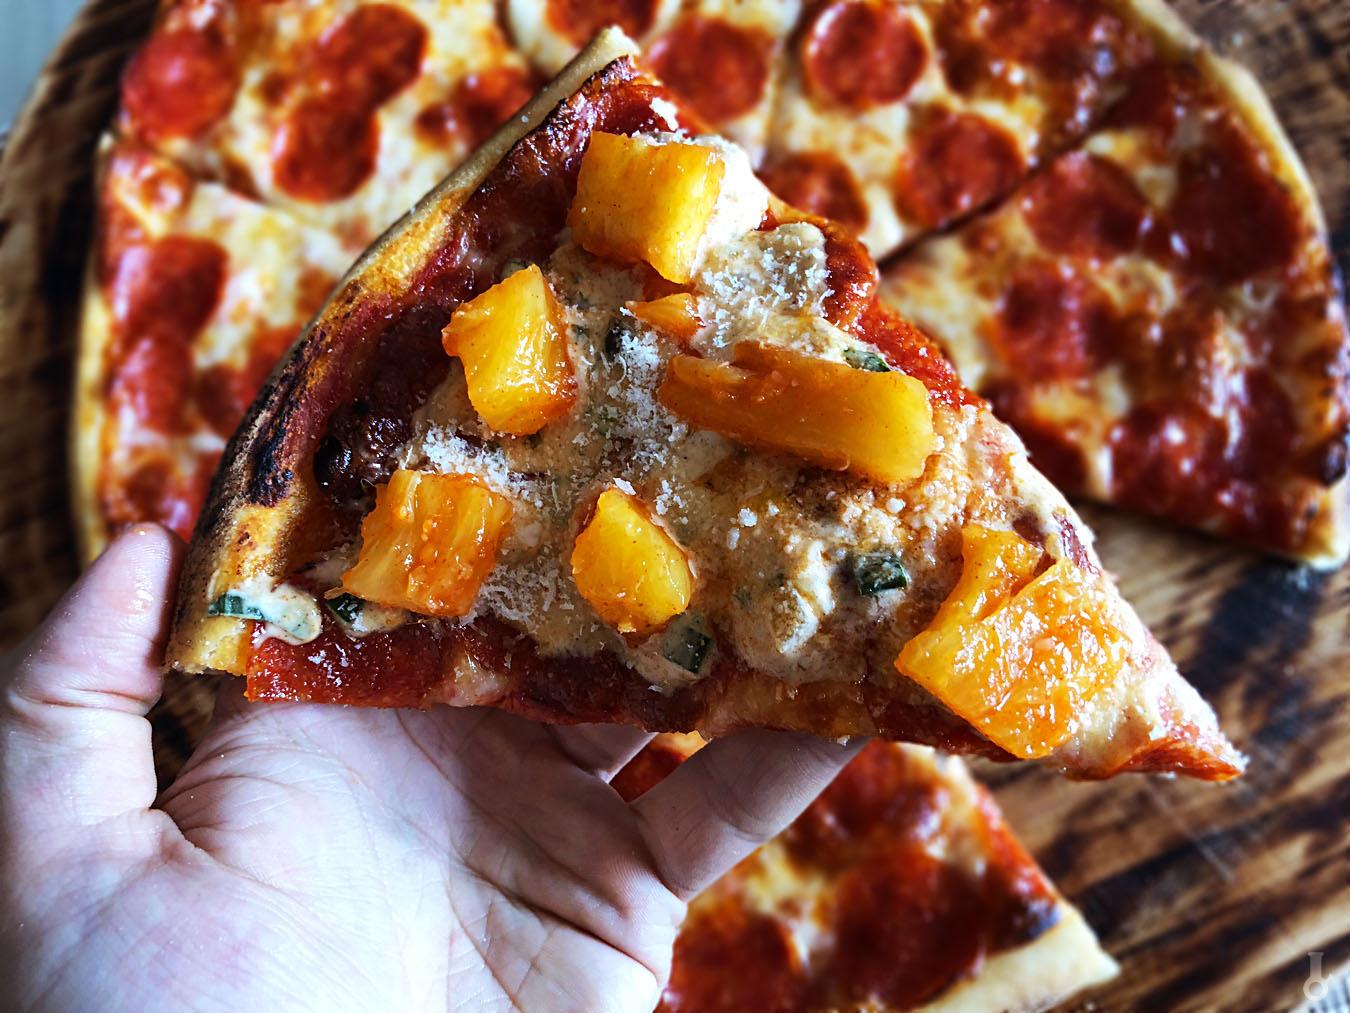 https://www.stonerchef.pl/wp-content/uploads/2018/07/pizza-z-kiszonezem-kimchi-z-ananasa-i-parmezanem.jpg